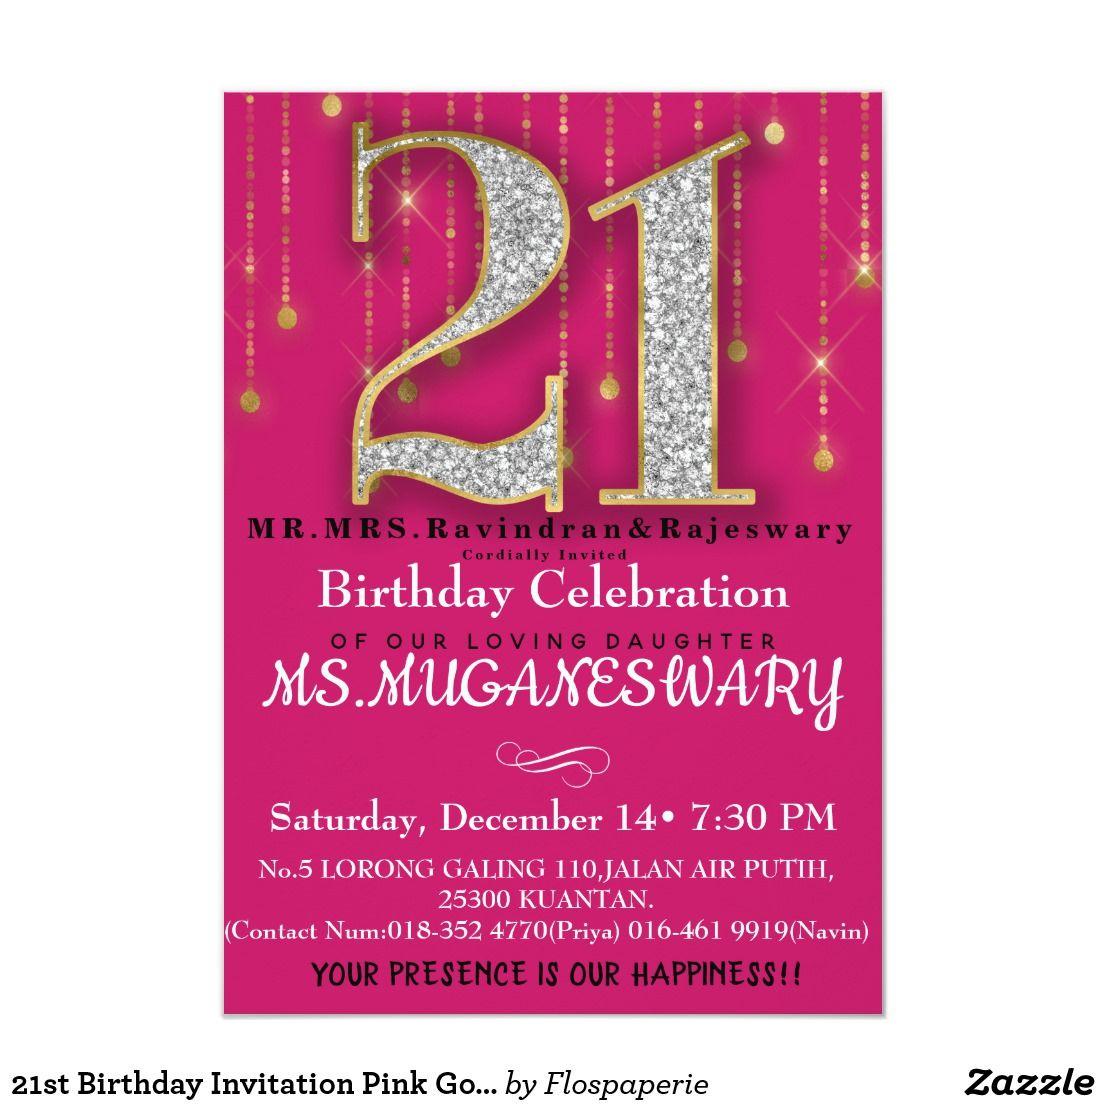 Create your own Invitation 21st birthday